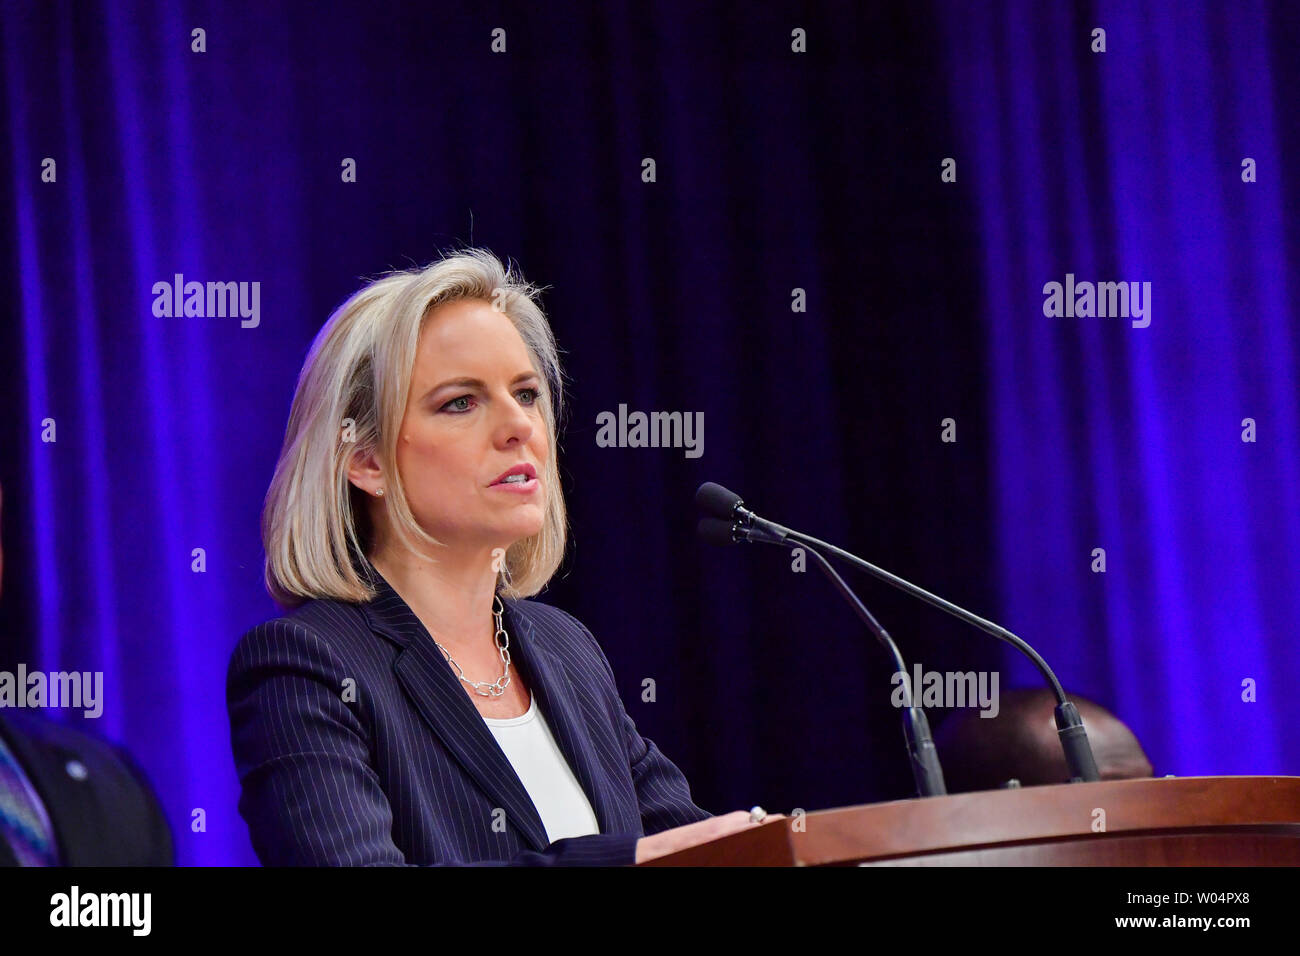 Kirstjen Nielsen, Secretary of Homeland Security, speaks at a